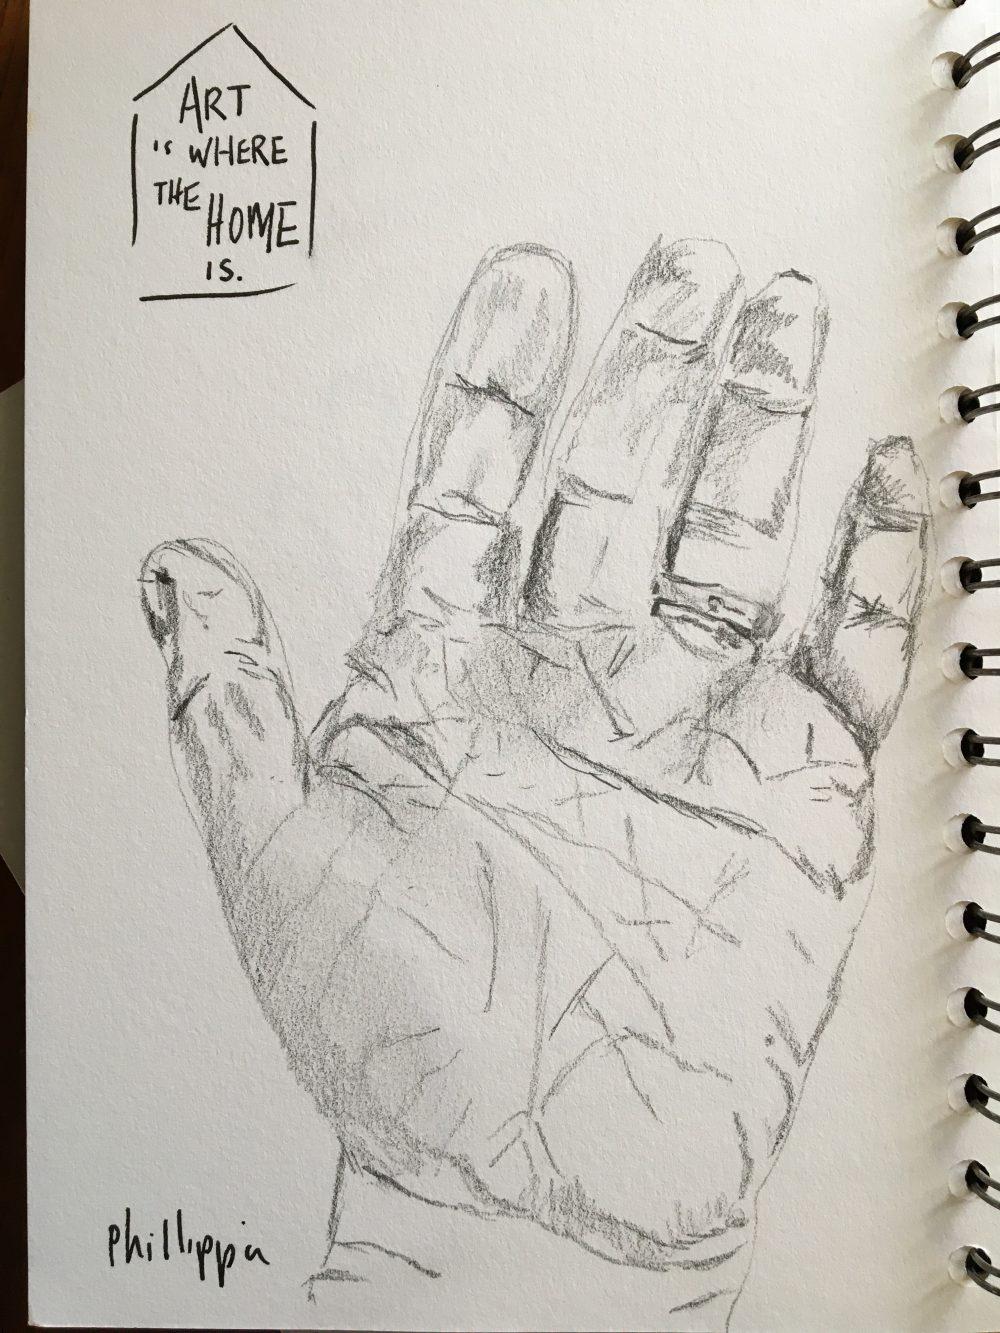 A waving hand drawn in pencil